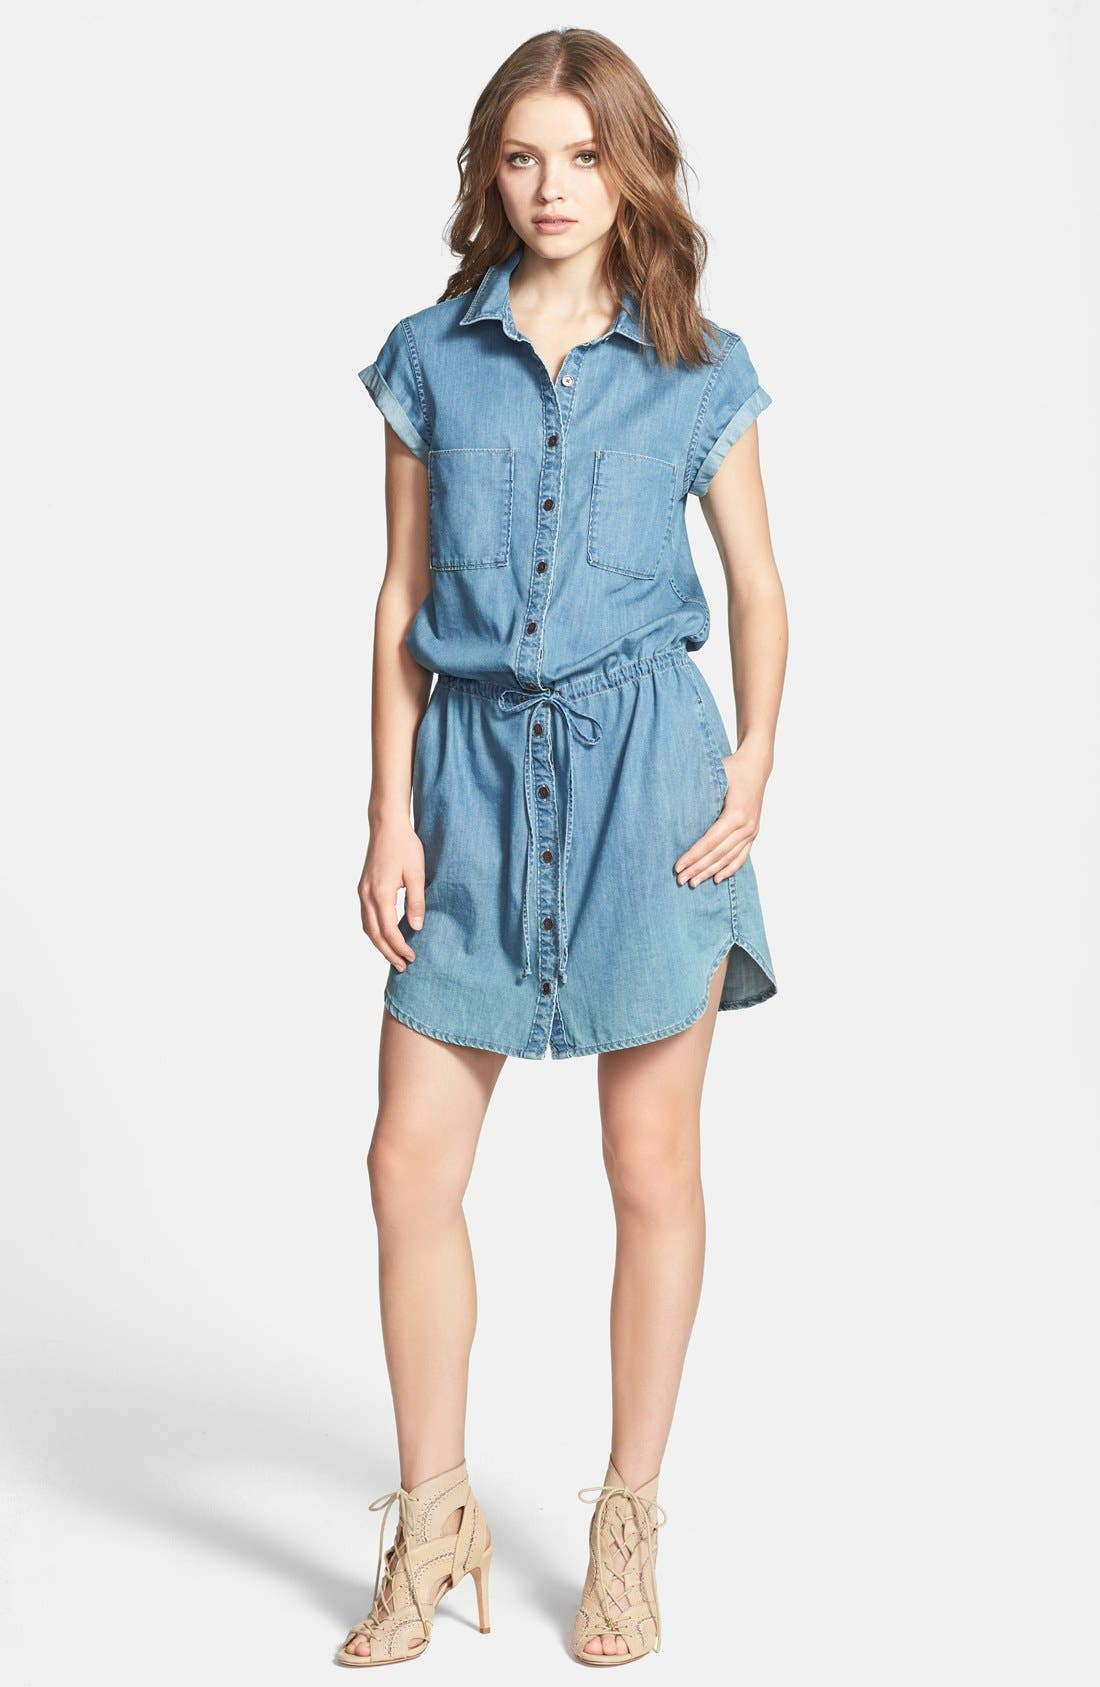 PAIGE, Denim 'Mila' Denim Shirtdress, Main thumbnail 1, color, 400